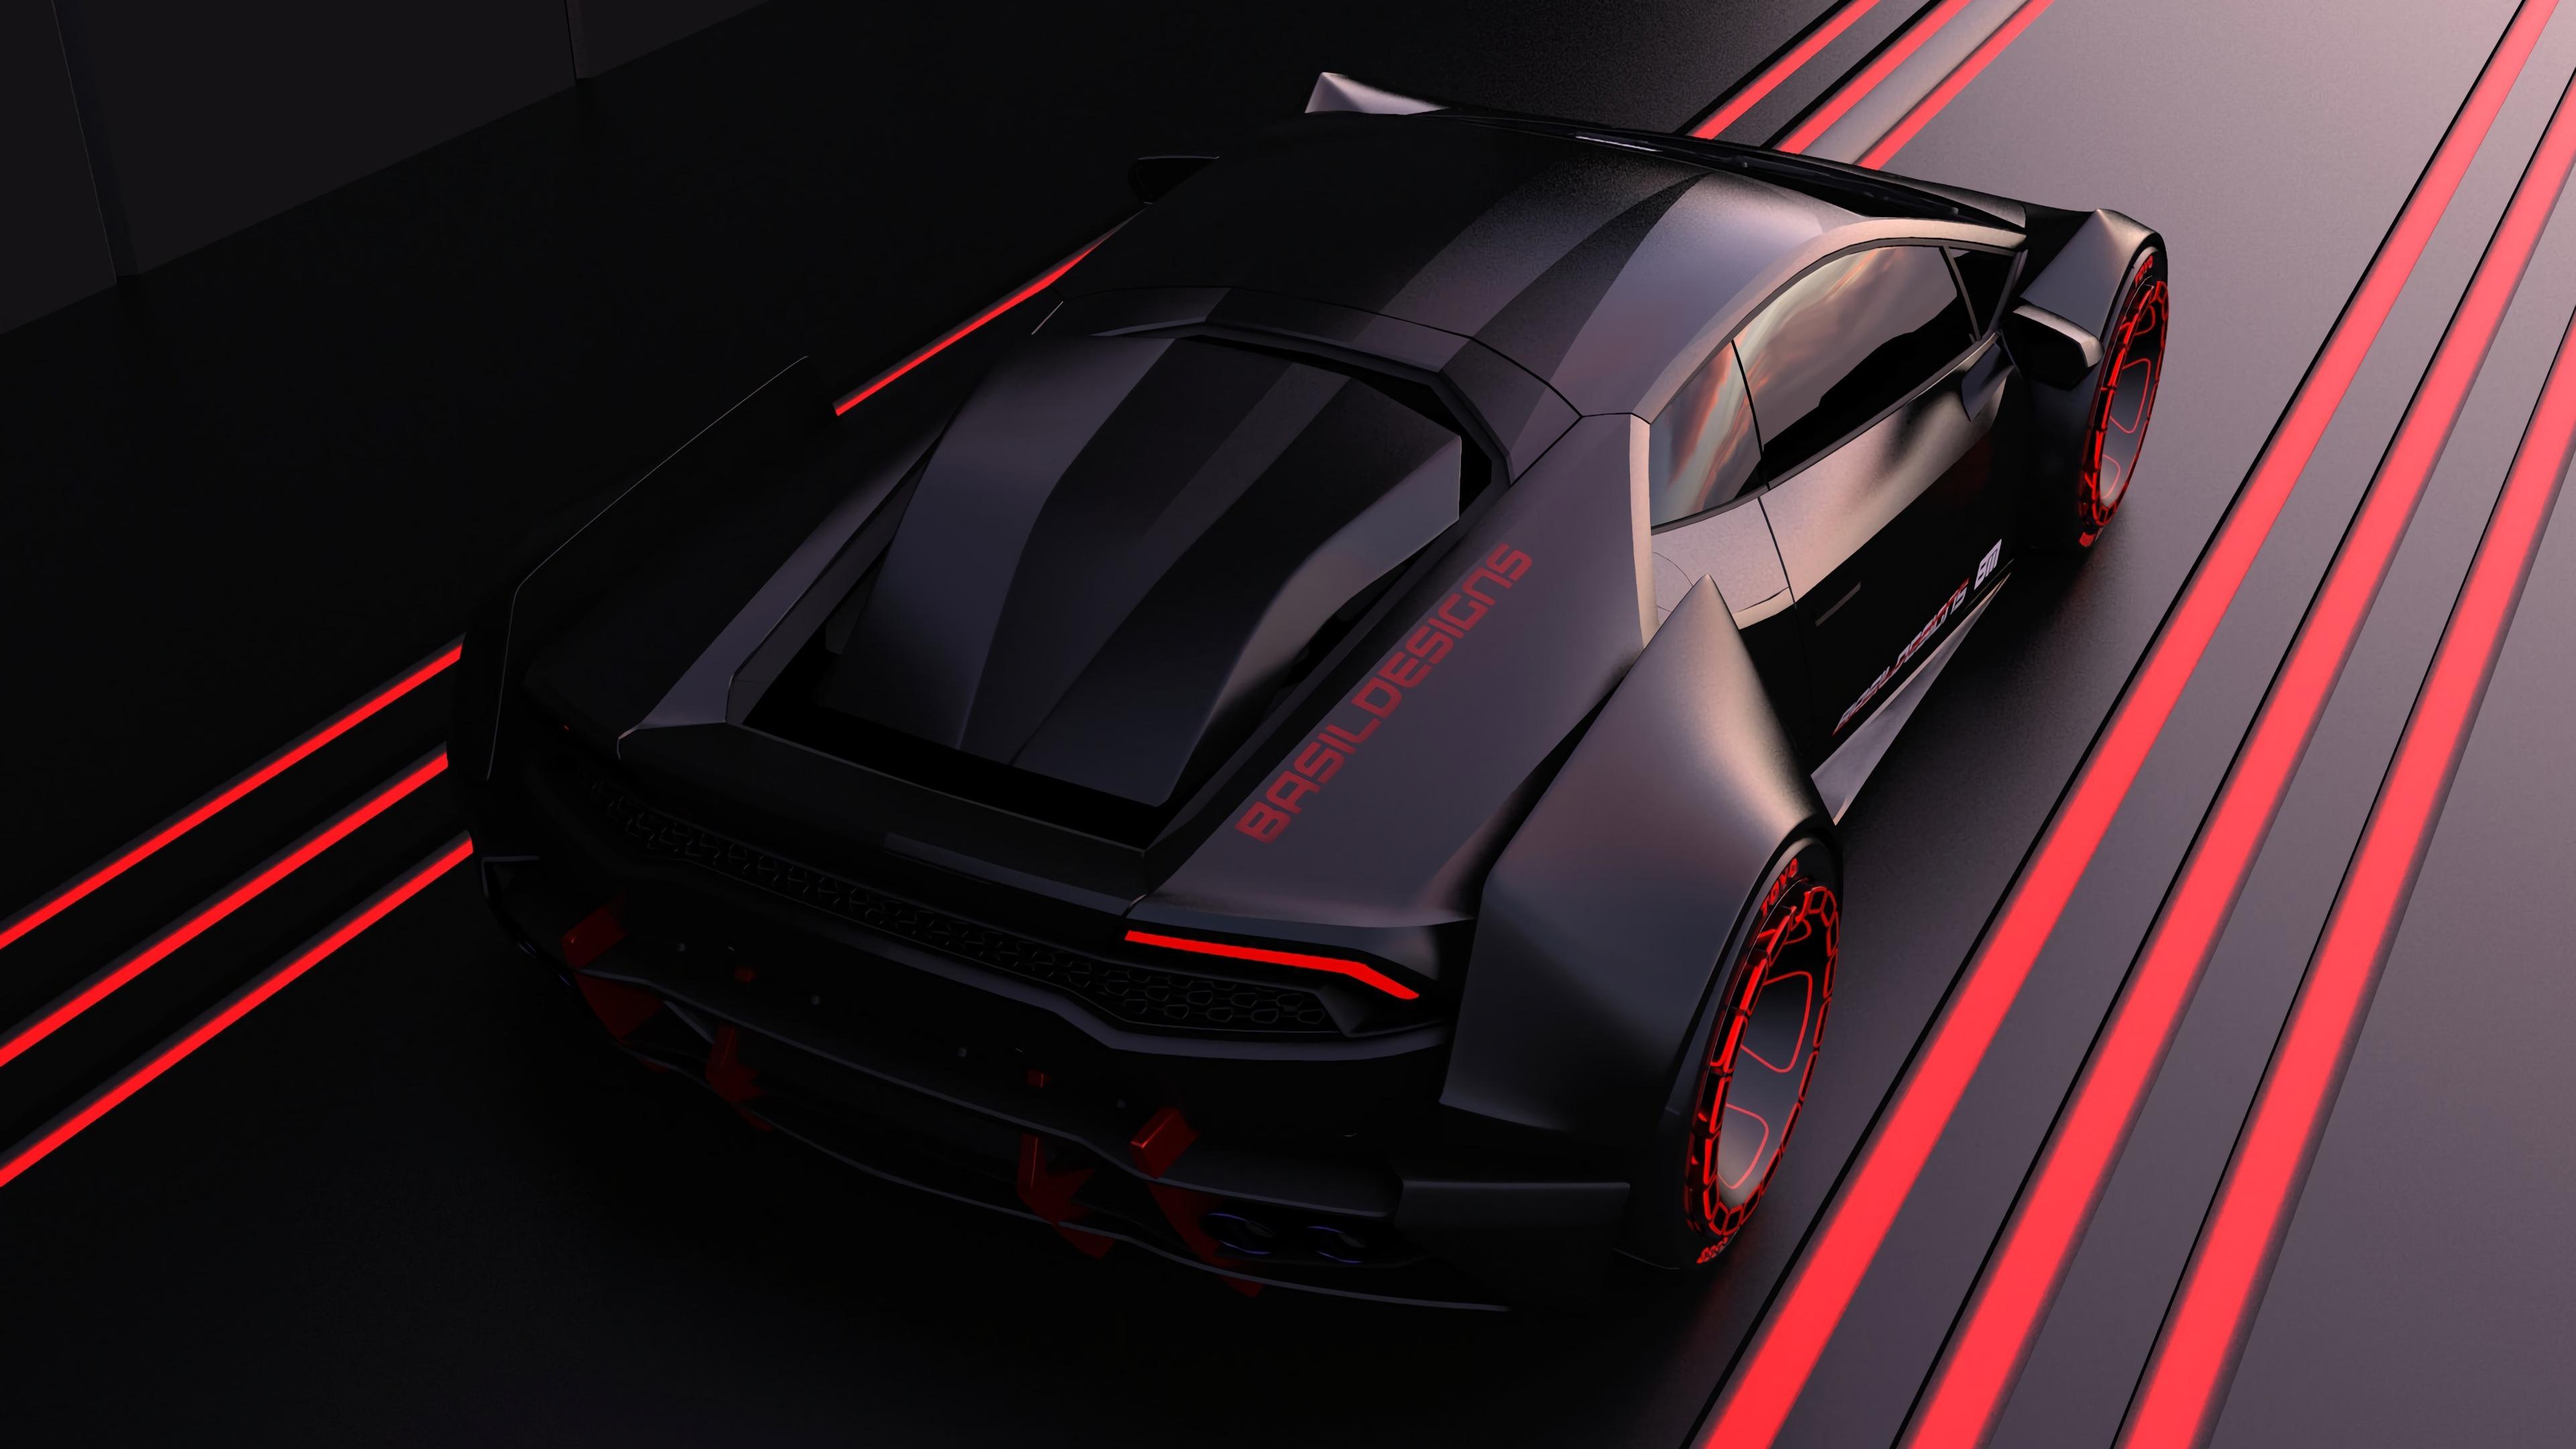 car design concept 4k 1556185167 - Car Design Concept 4k - hd-wallpapers, digital art wallpapers, cars wallpapers, artstation wallpapers, artist wallpapers, 4k-wallpapers